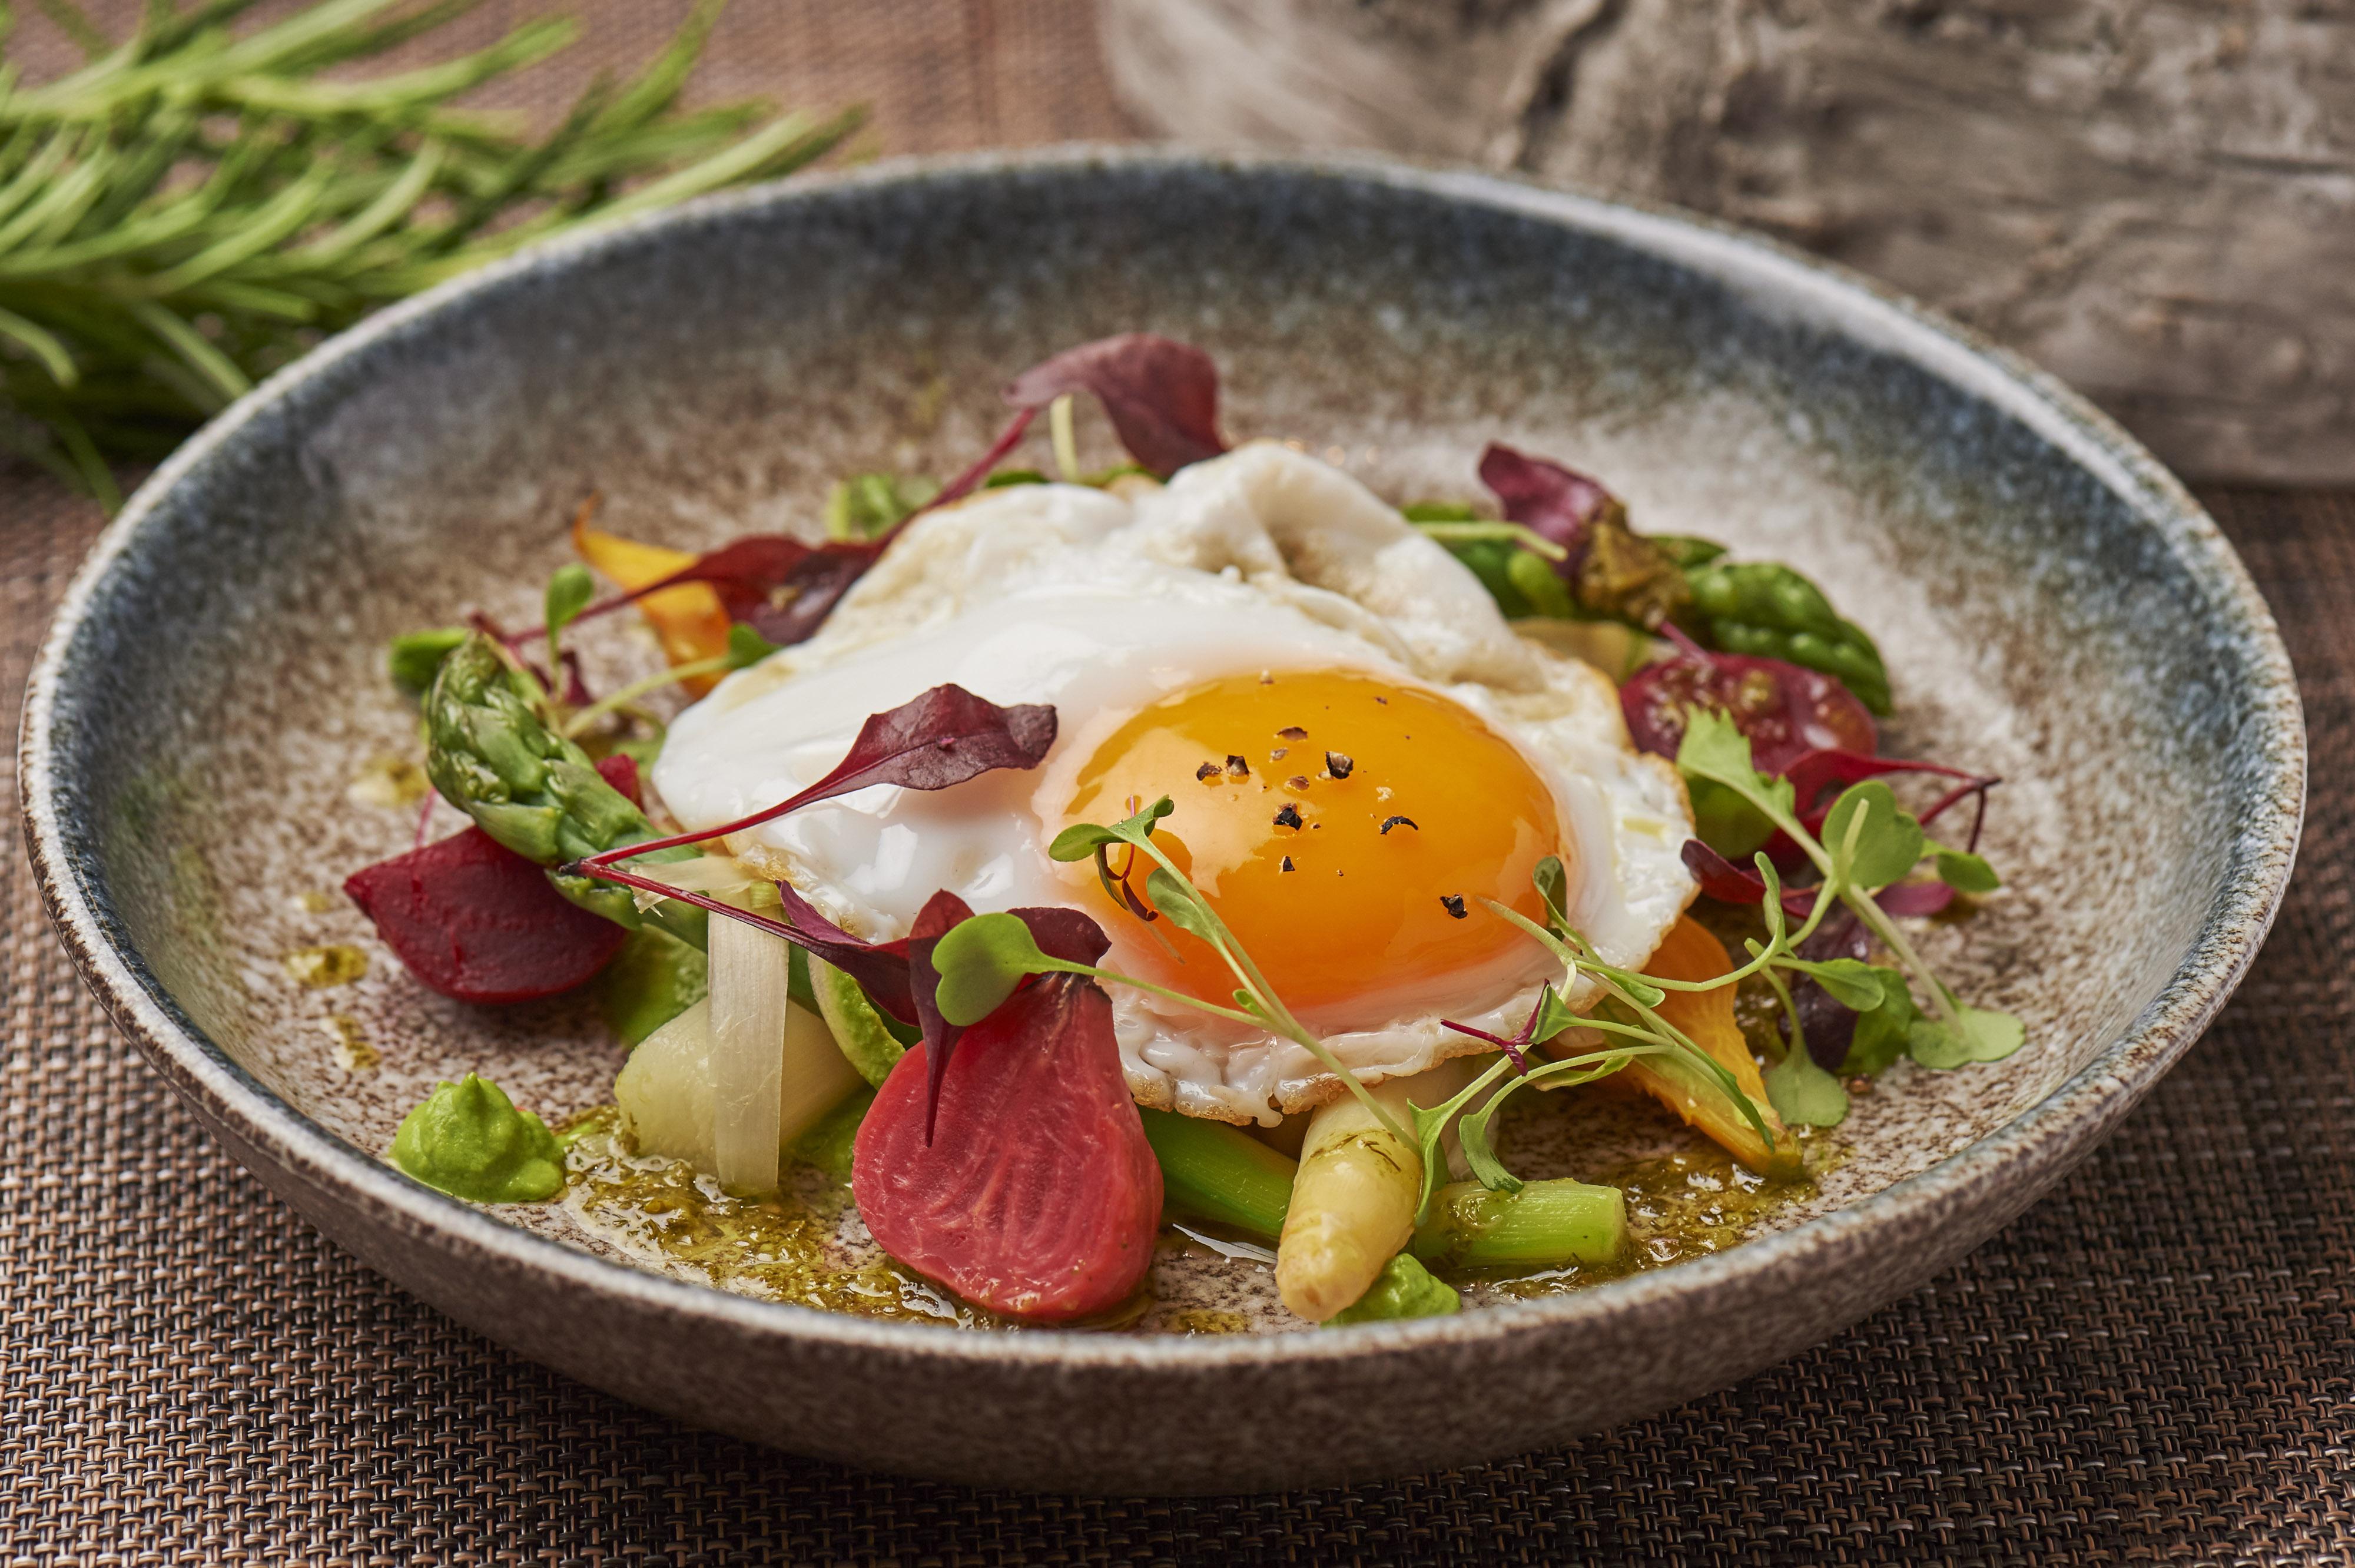 Try the new Summer Kitchen Garden menu at the Blue Boar Restaurant ...